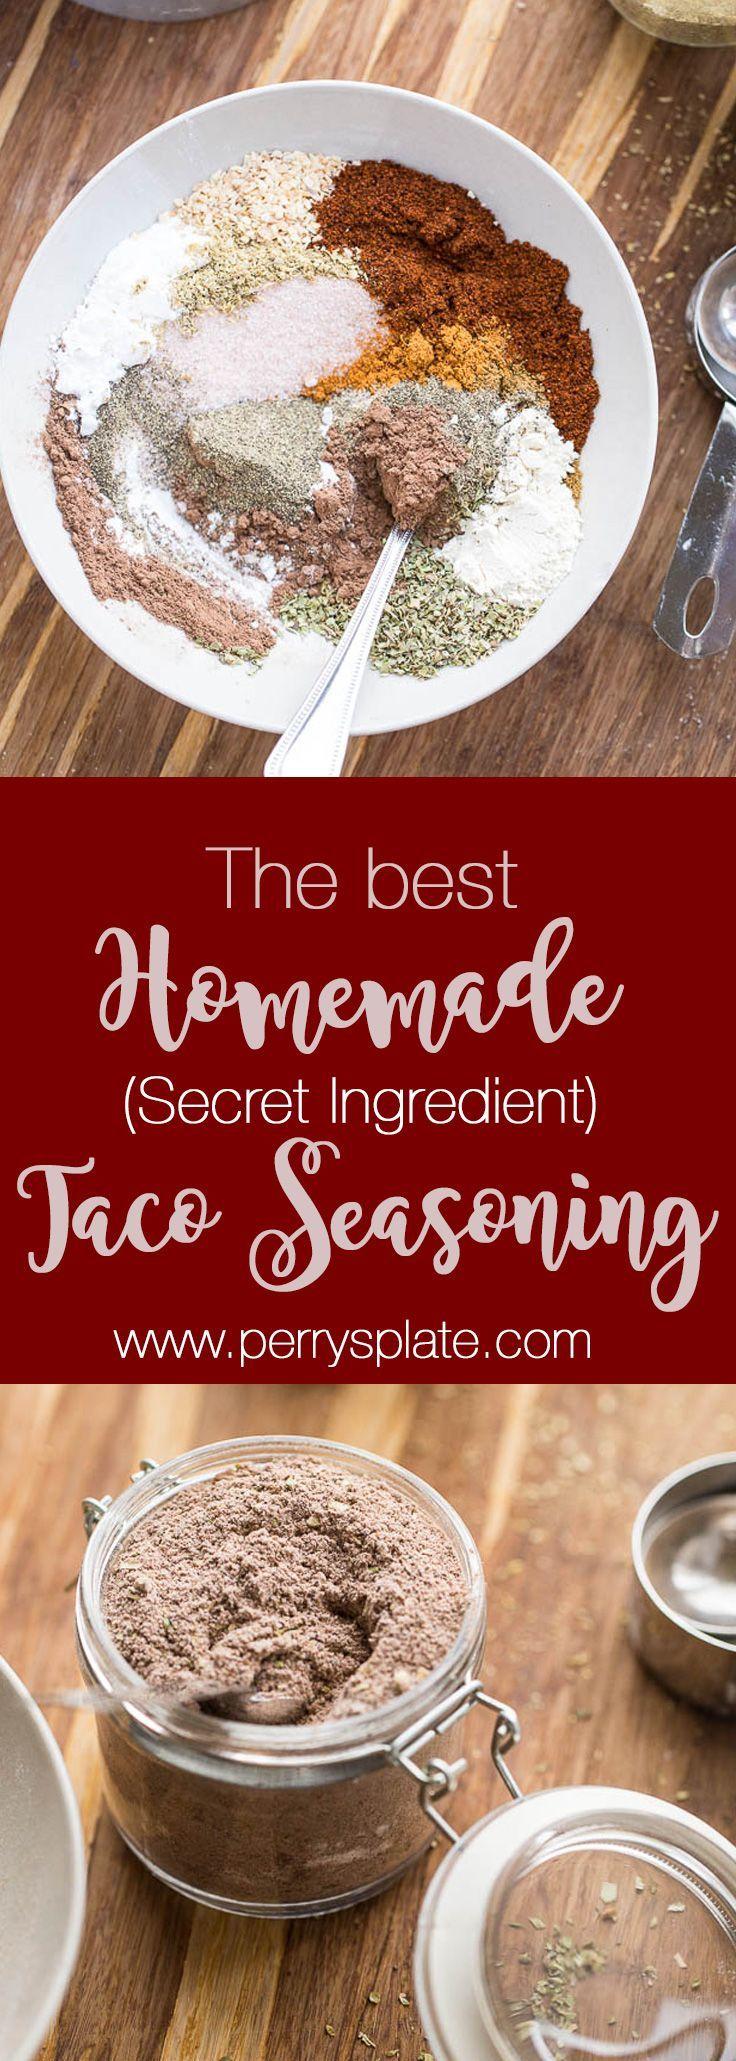 Homemade Taco Seasoning so good you'll give it away as a gift! | paleo recipes | whole30 recipes | taco recipes | perrysplate.com